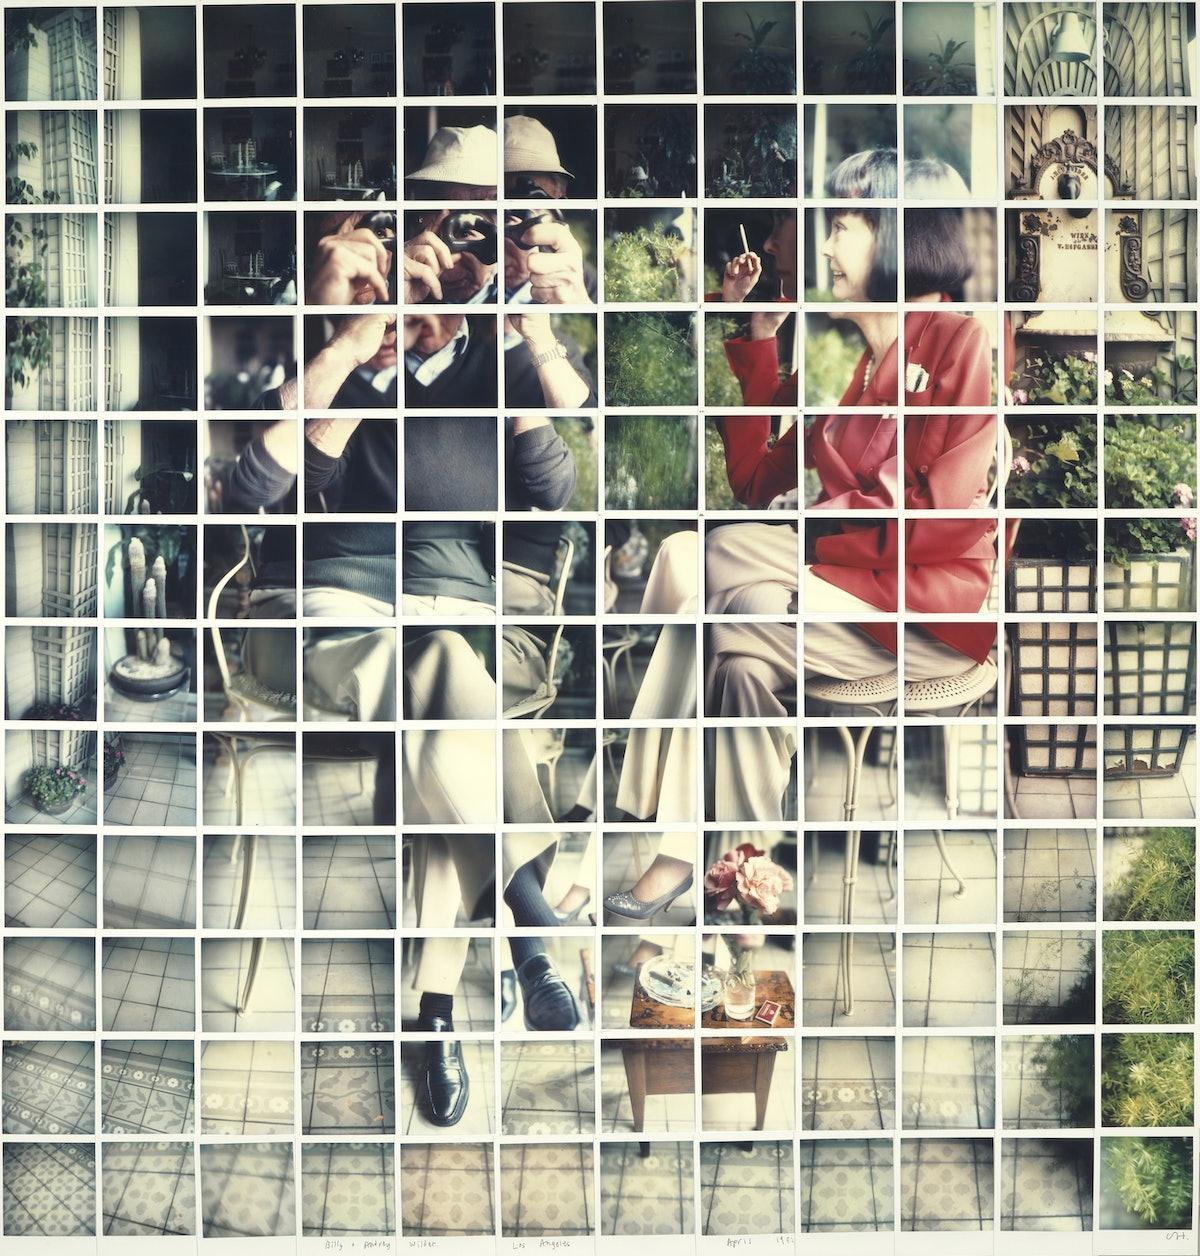 Billy & Audrey Wilder, Los Angeles, April 1982 1982.jpg